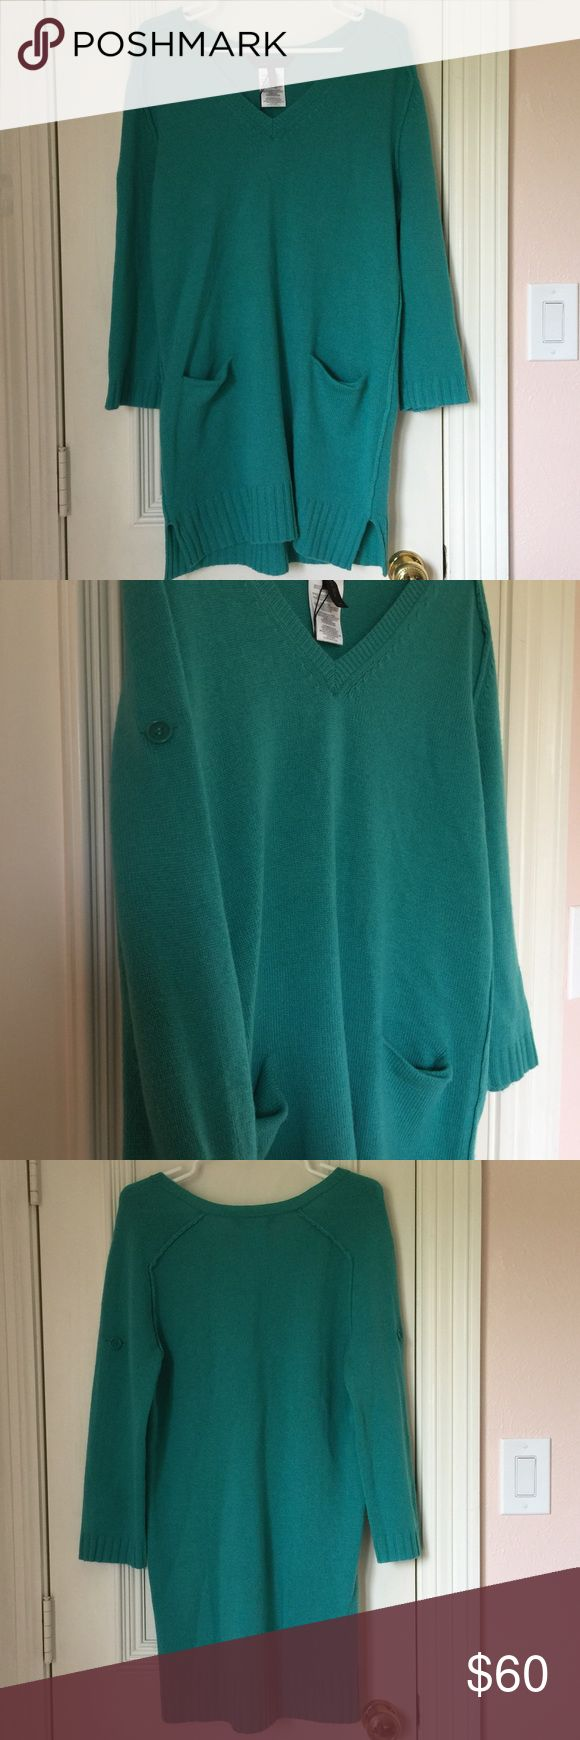 NWT Bcbgmaxazria Sea Green Sweater Dress Beautiful sea green sweater dress. Brand new with tags! BCBGMaxAzria Dresses